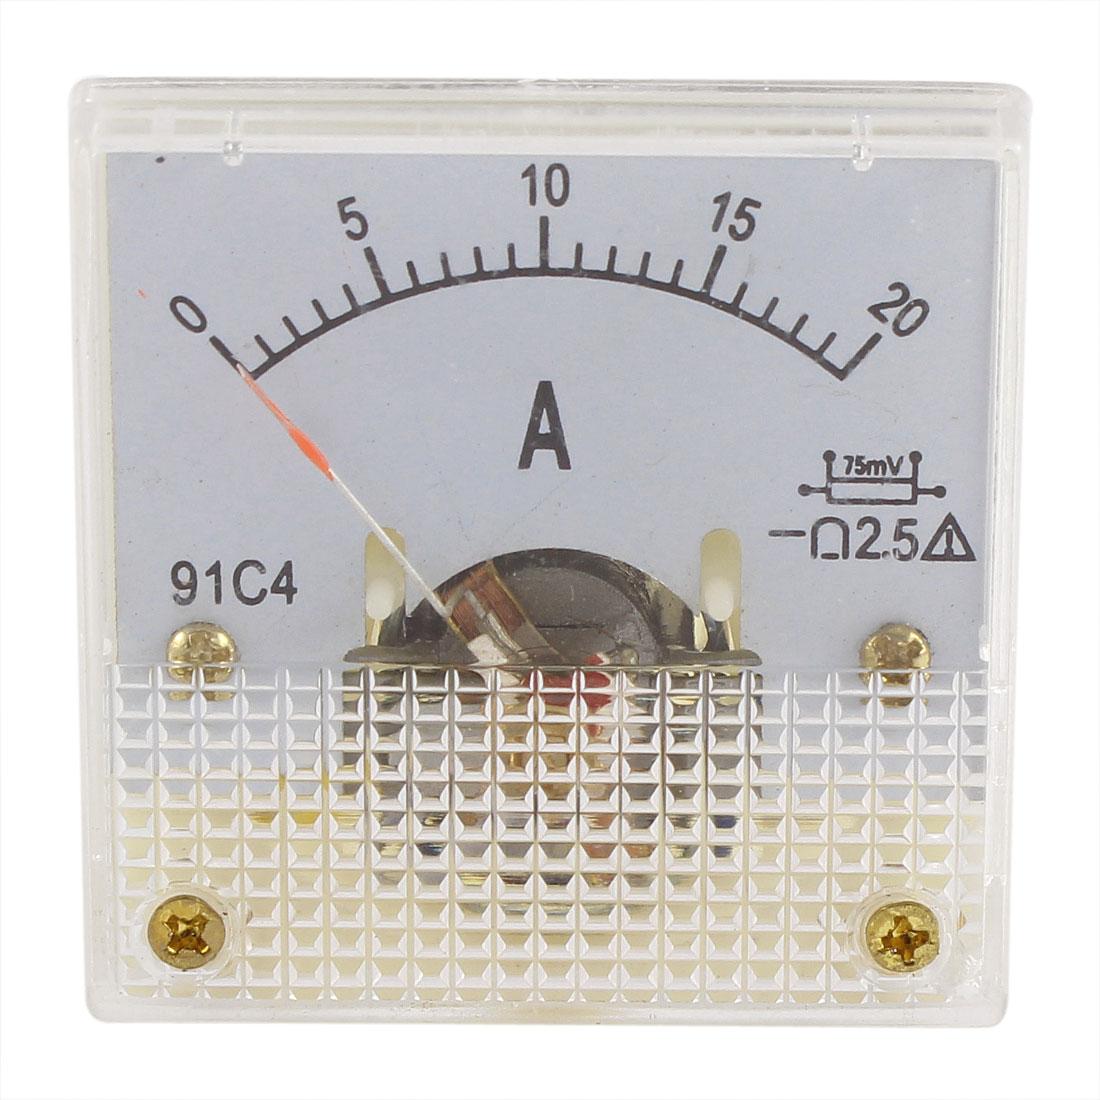 91C4 DC 0-20A Rectangle Mini Analog Panel Ammeter Gauge Amperemeter Class 2.5